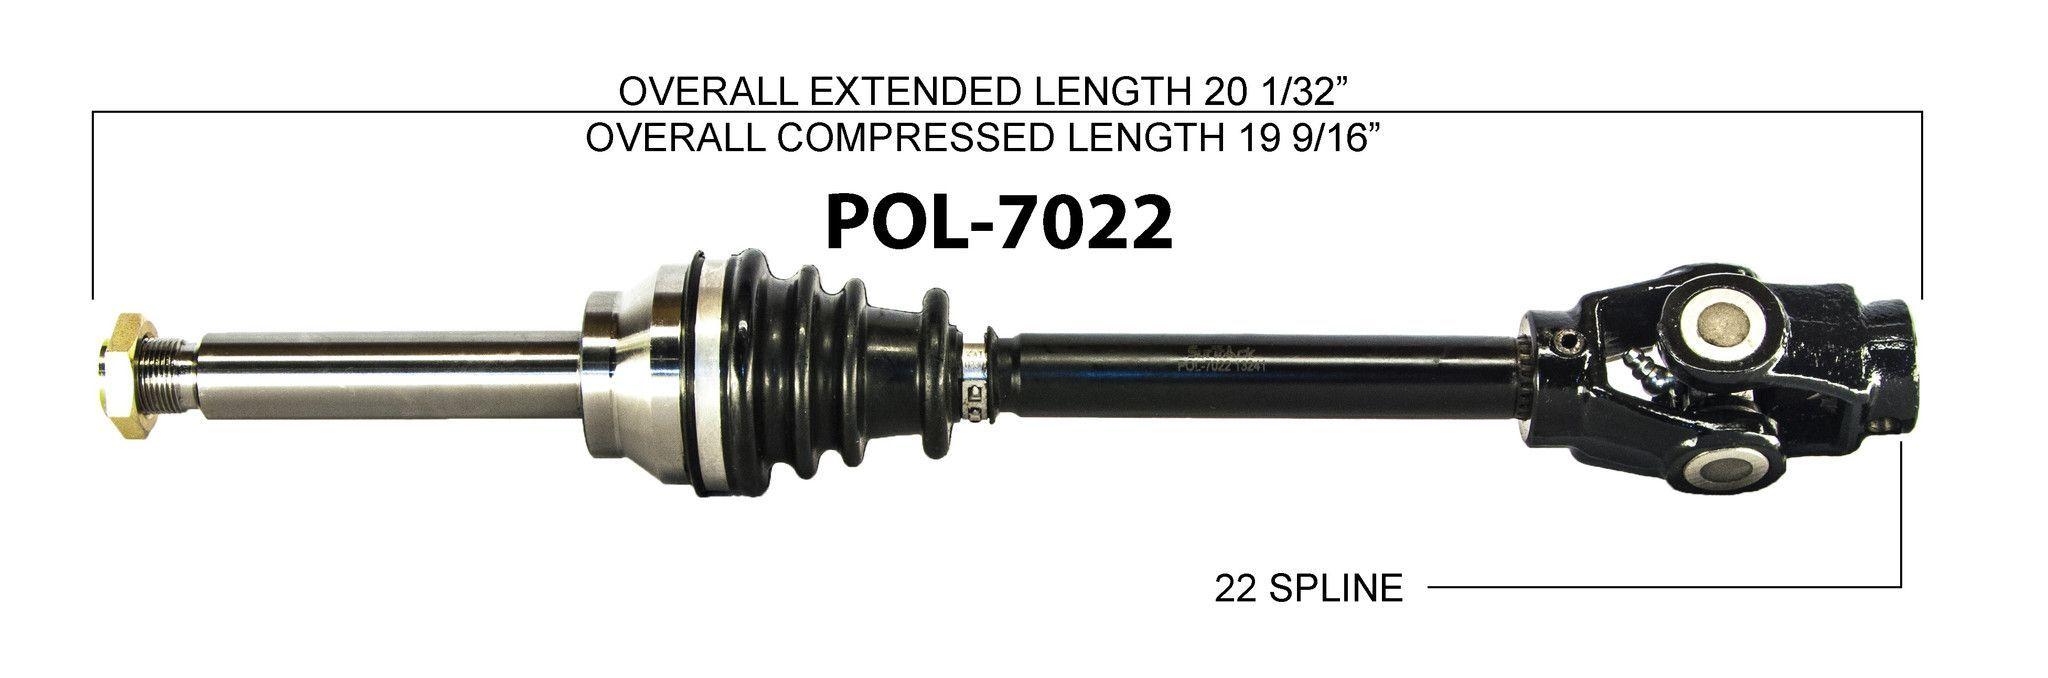 1989 Polaris Trail Boss 250 Front Right Left CV axle shaft